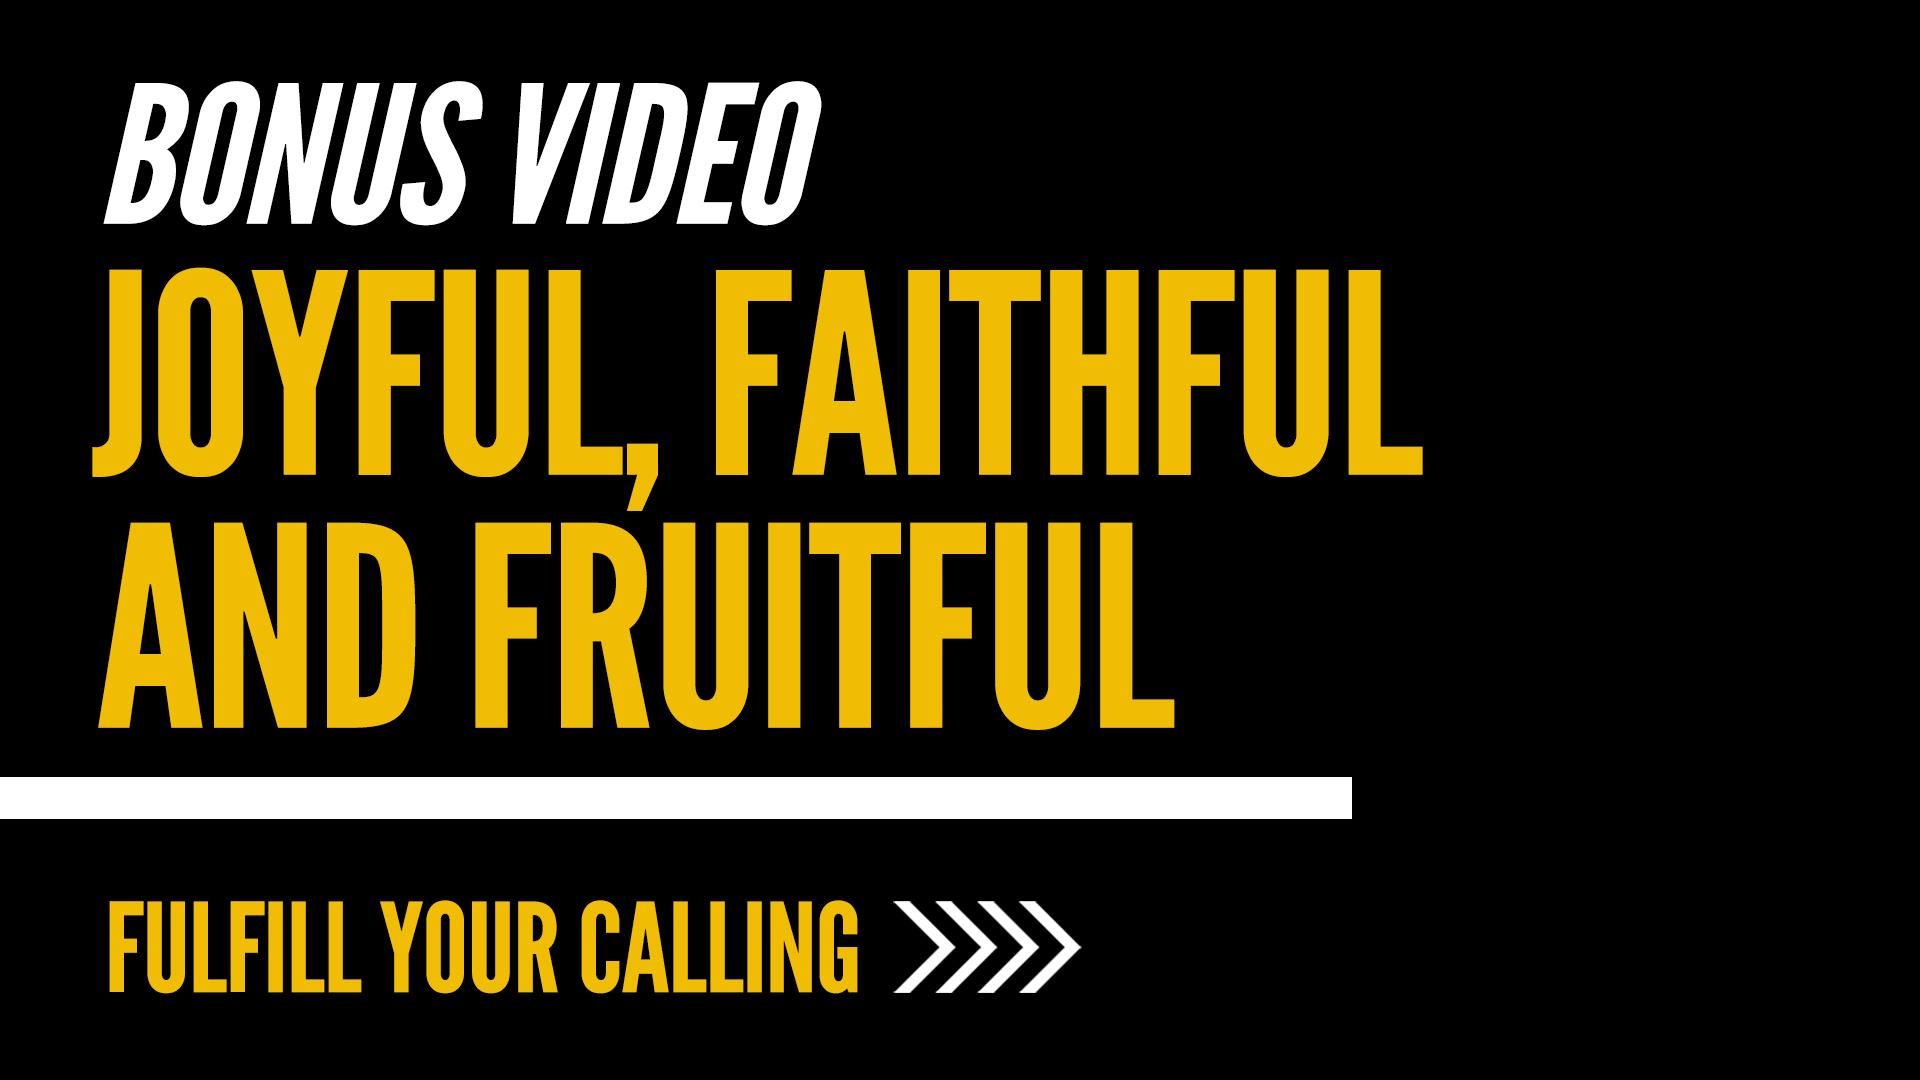 Bonus video: Joyful, Faithful and Fruitful - David Steele - Fulfill Your Calling Video Series